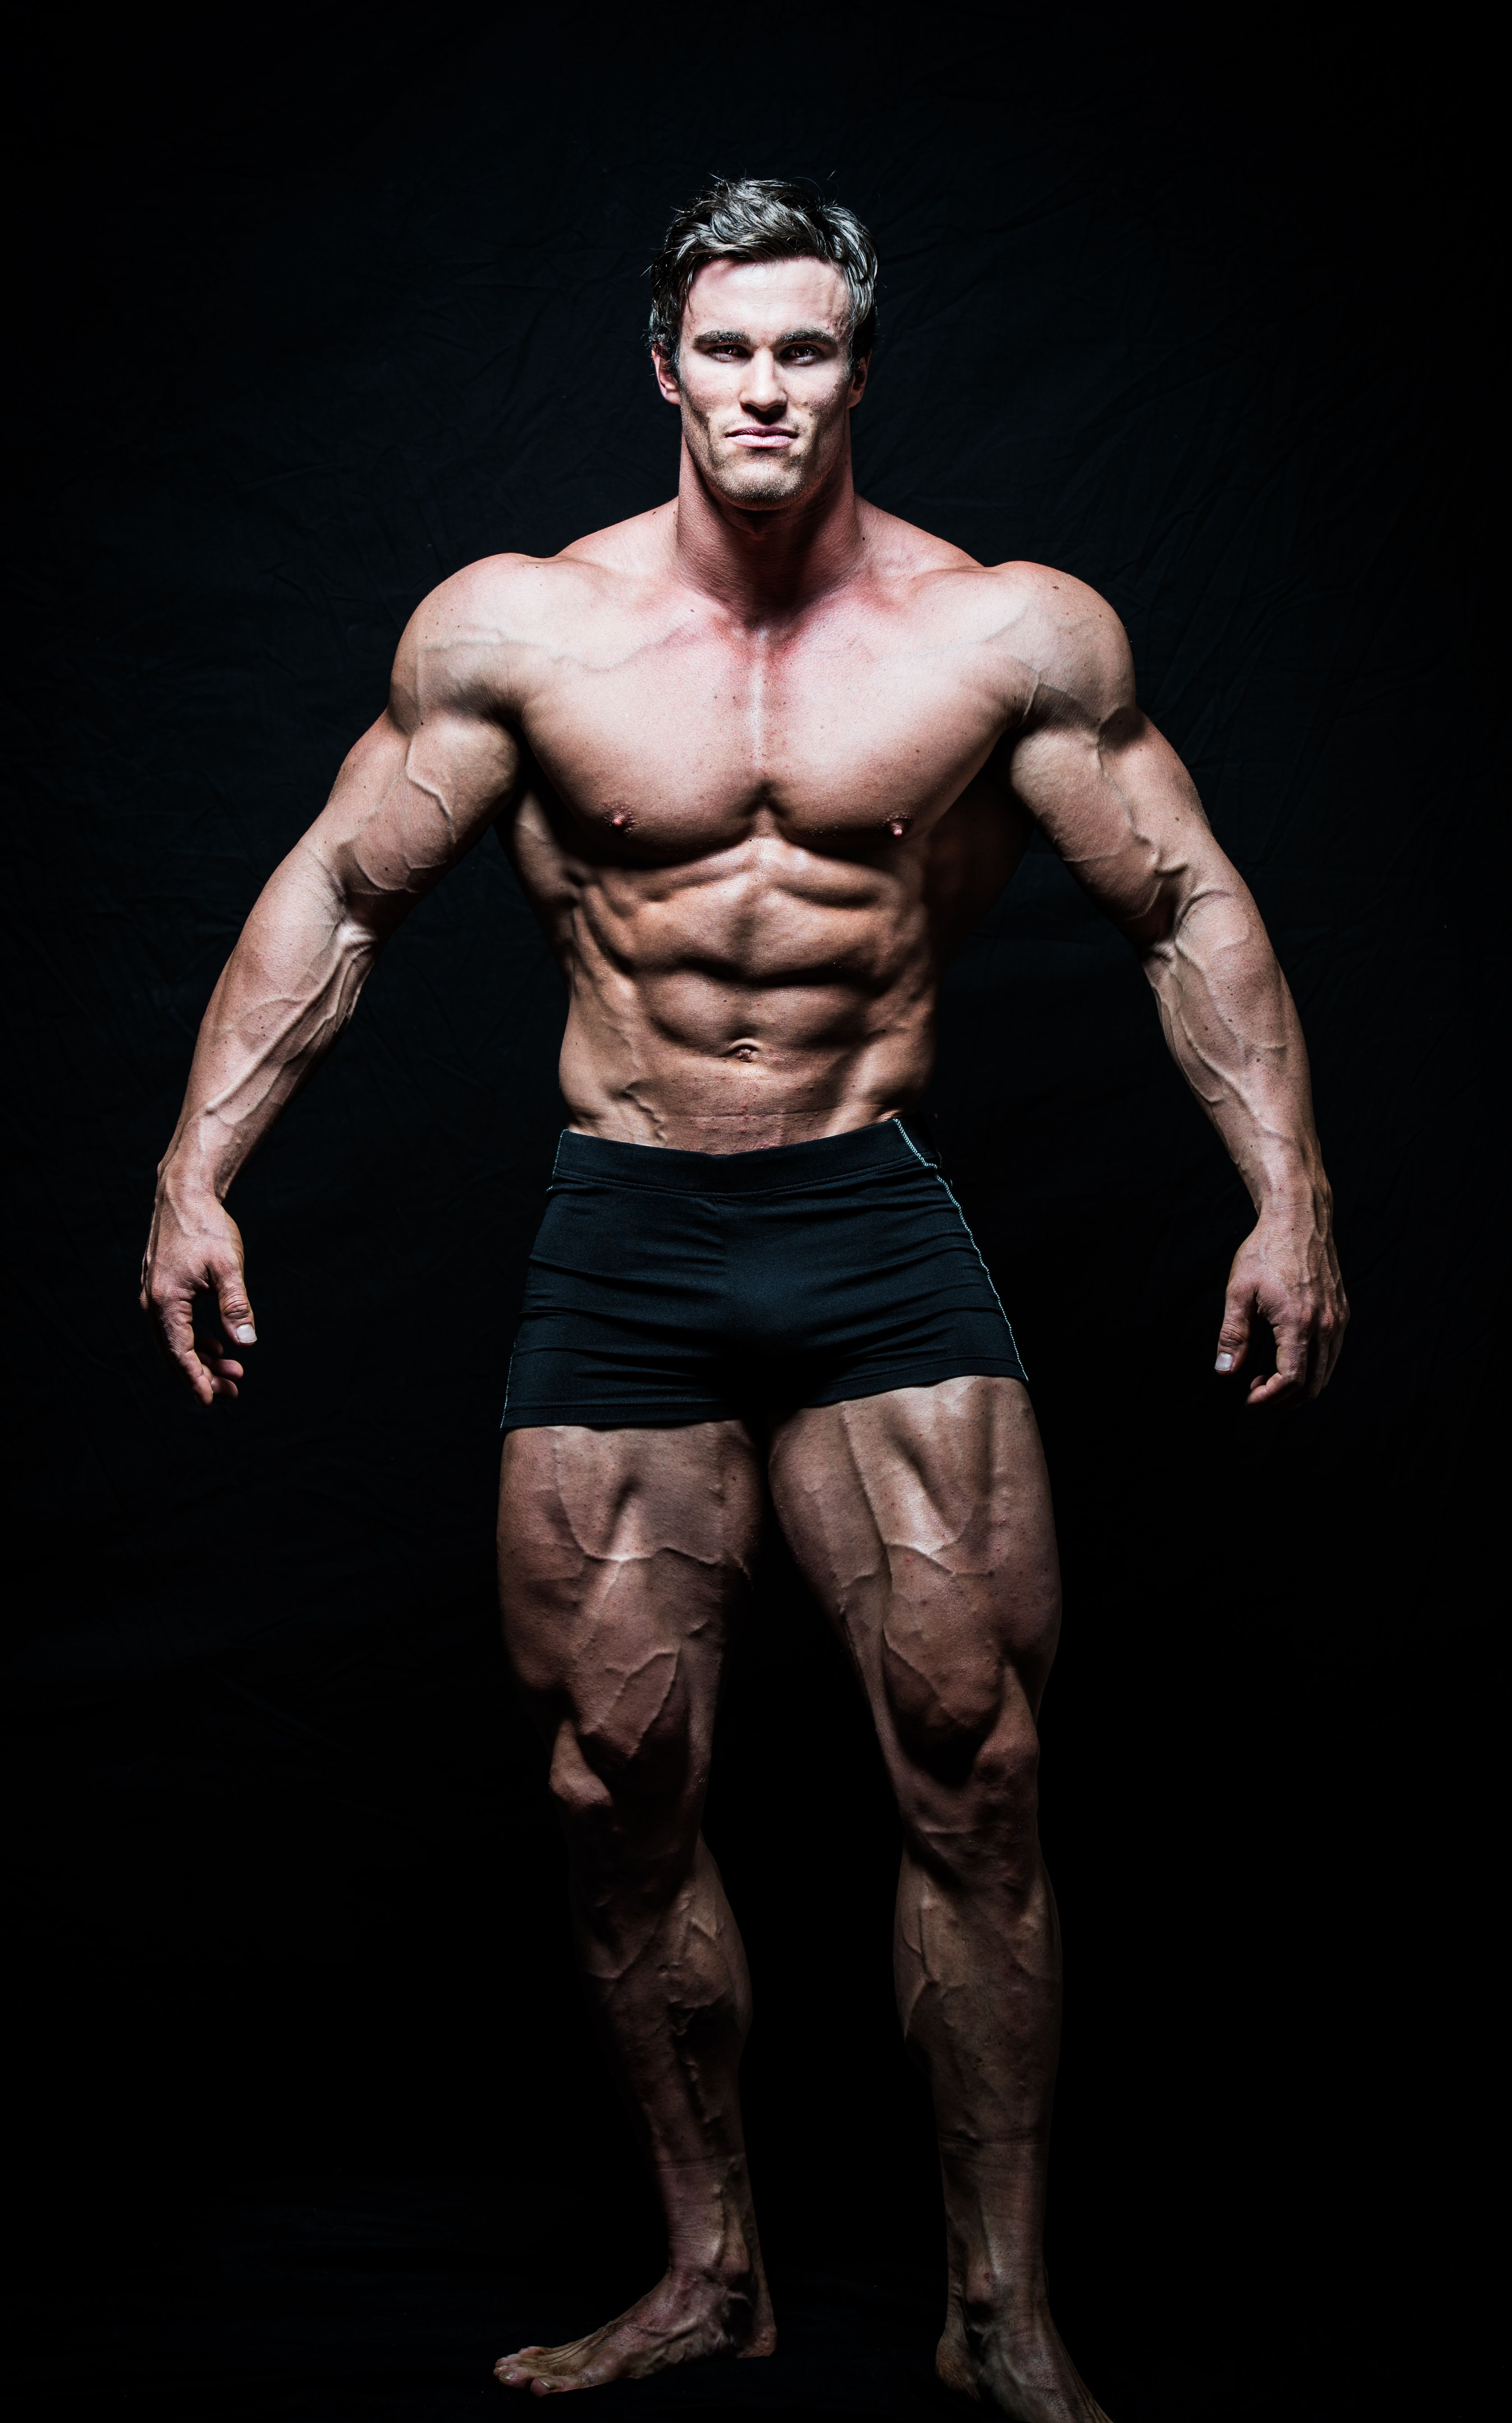 Bodybuilder Calum von Moger Reveals Pose Arnold